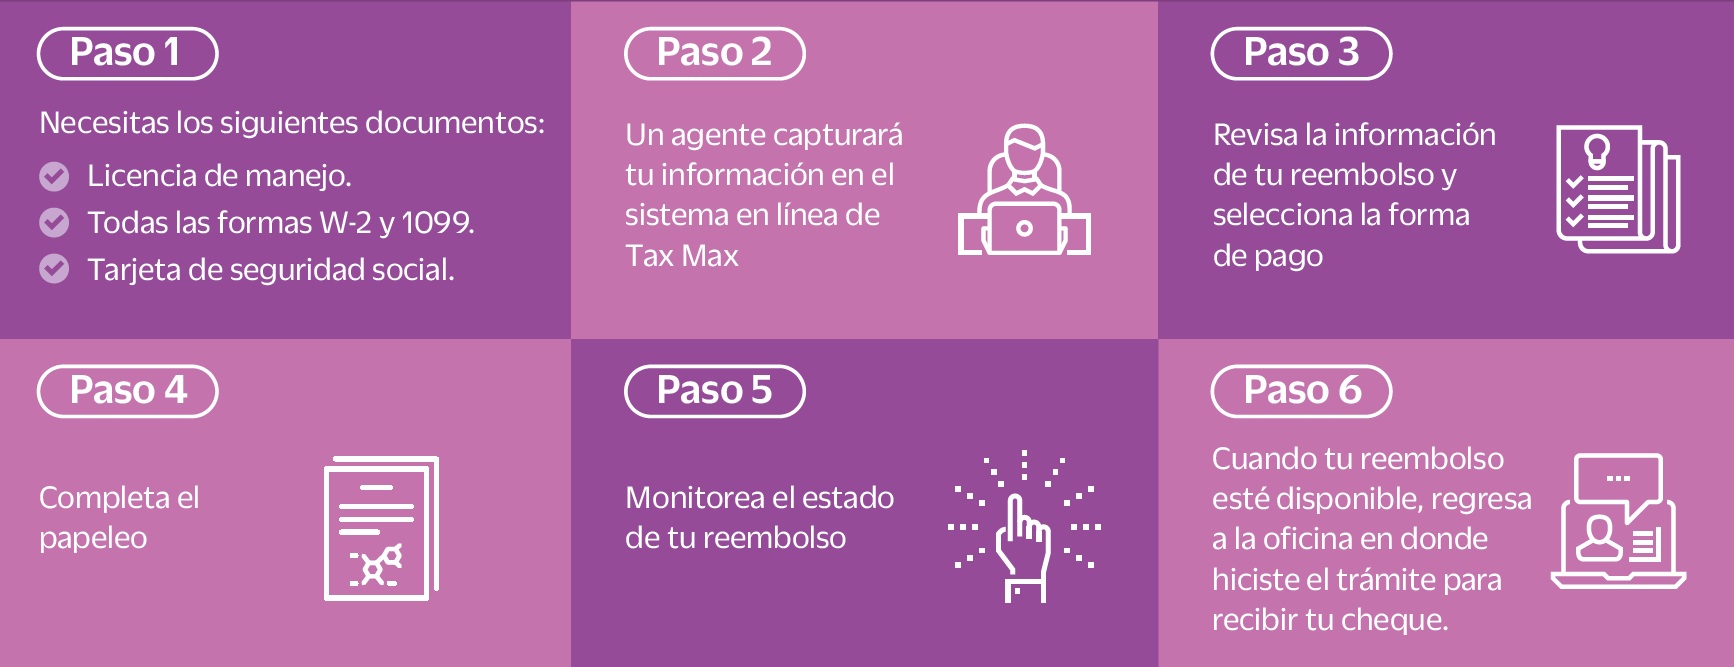 Infografia_seis_pasos_para_preparar_impuestos